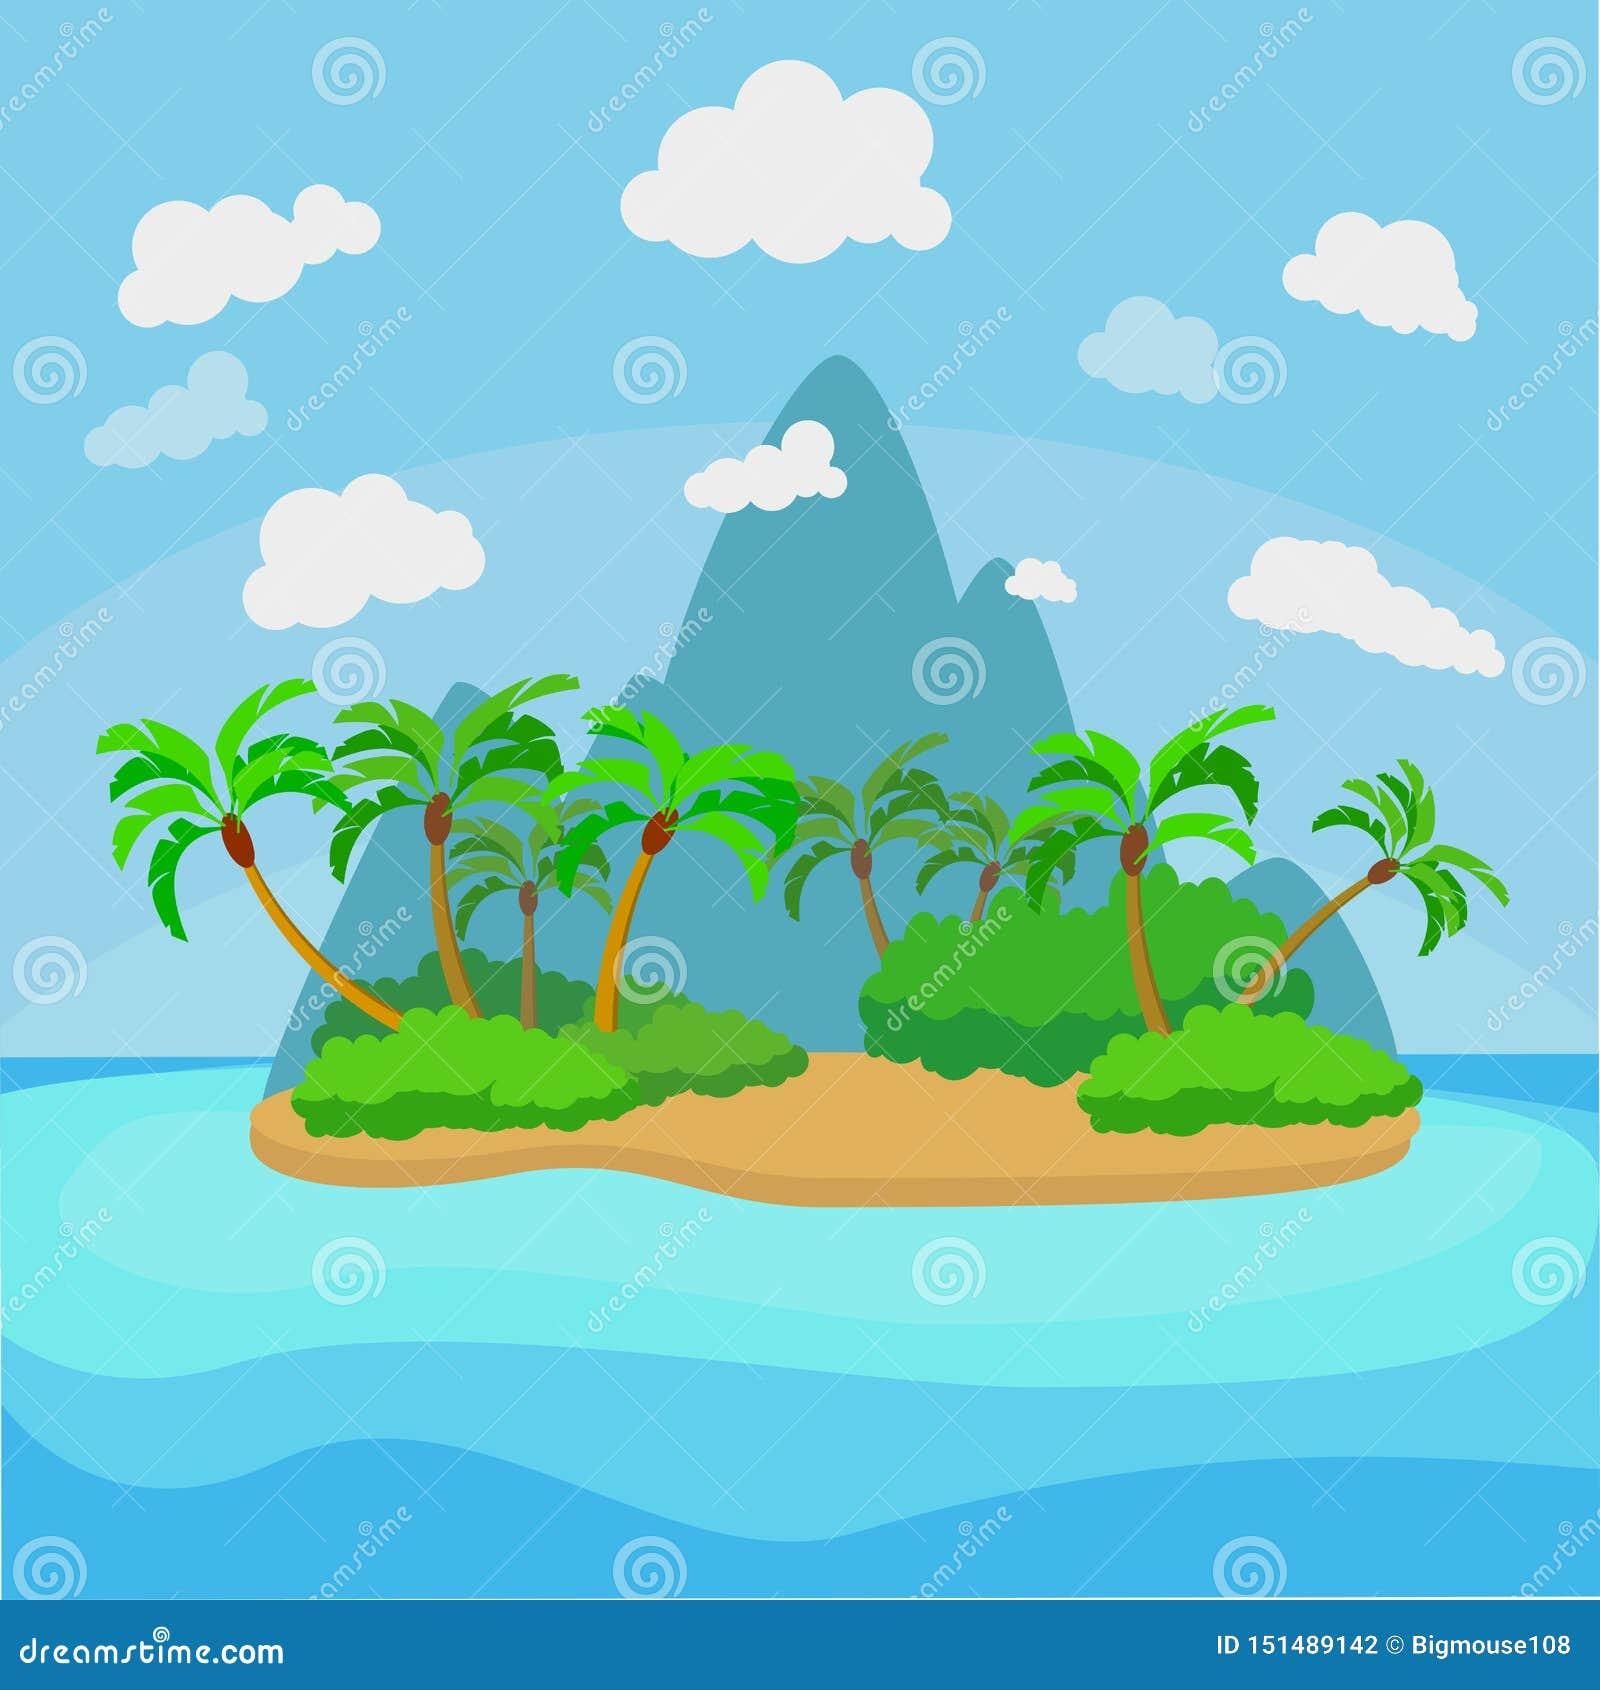 Tropical Island Paradise: Cartoon Tropical Island Landscape Background Scene. Vector